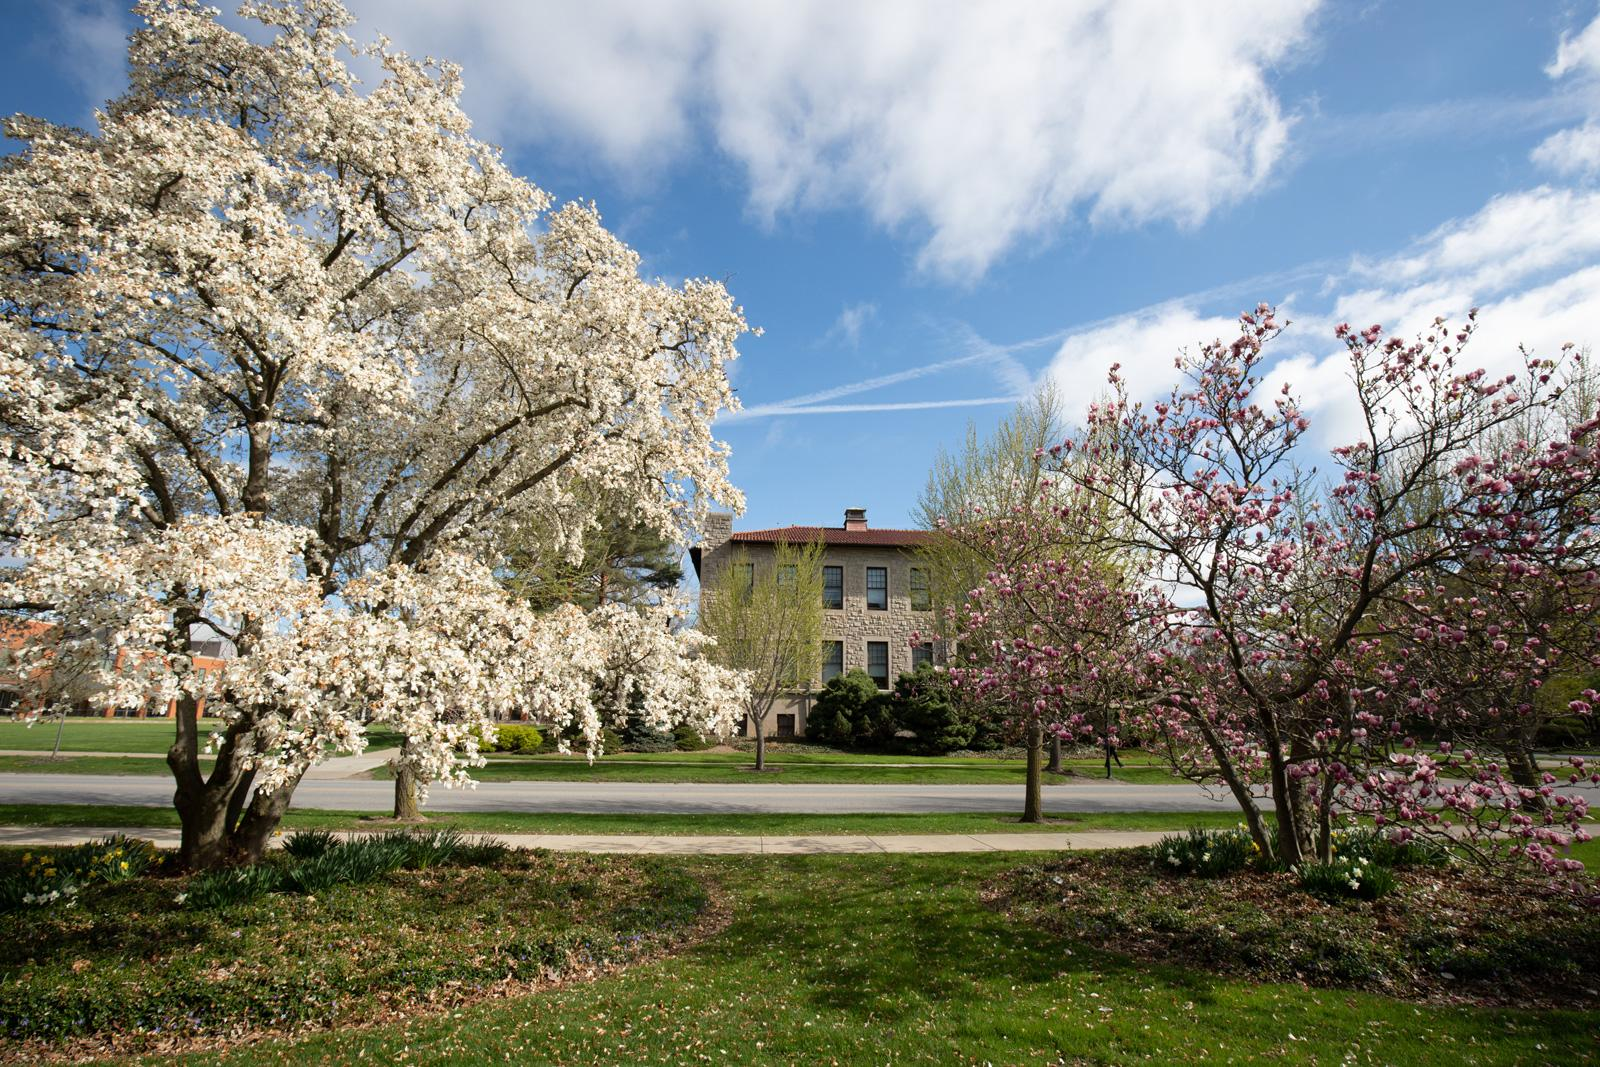 Flowering trees on campus.